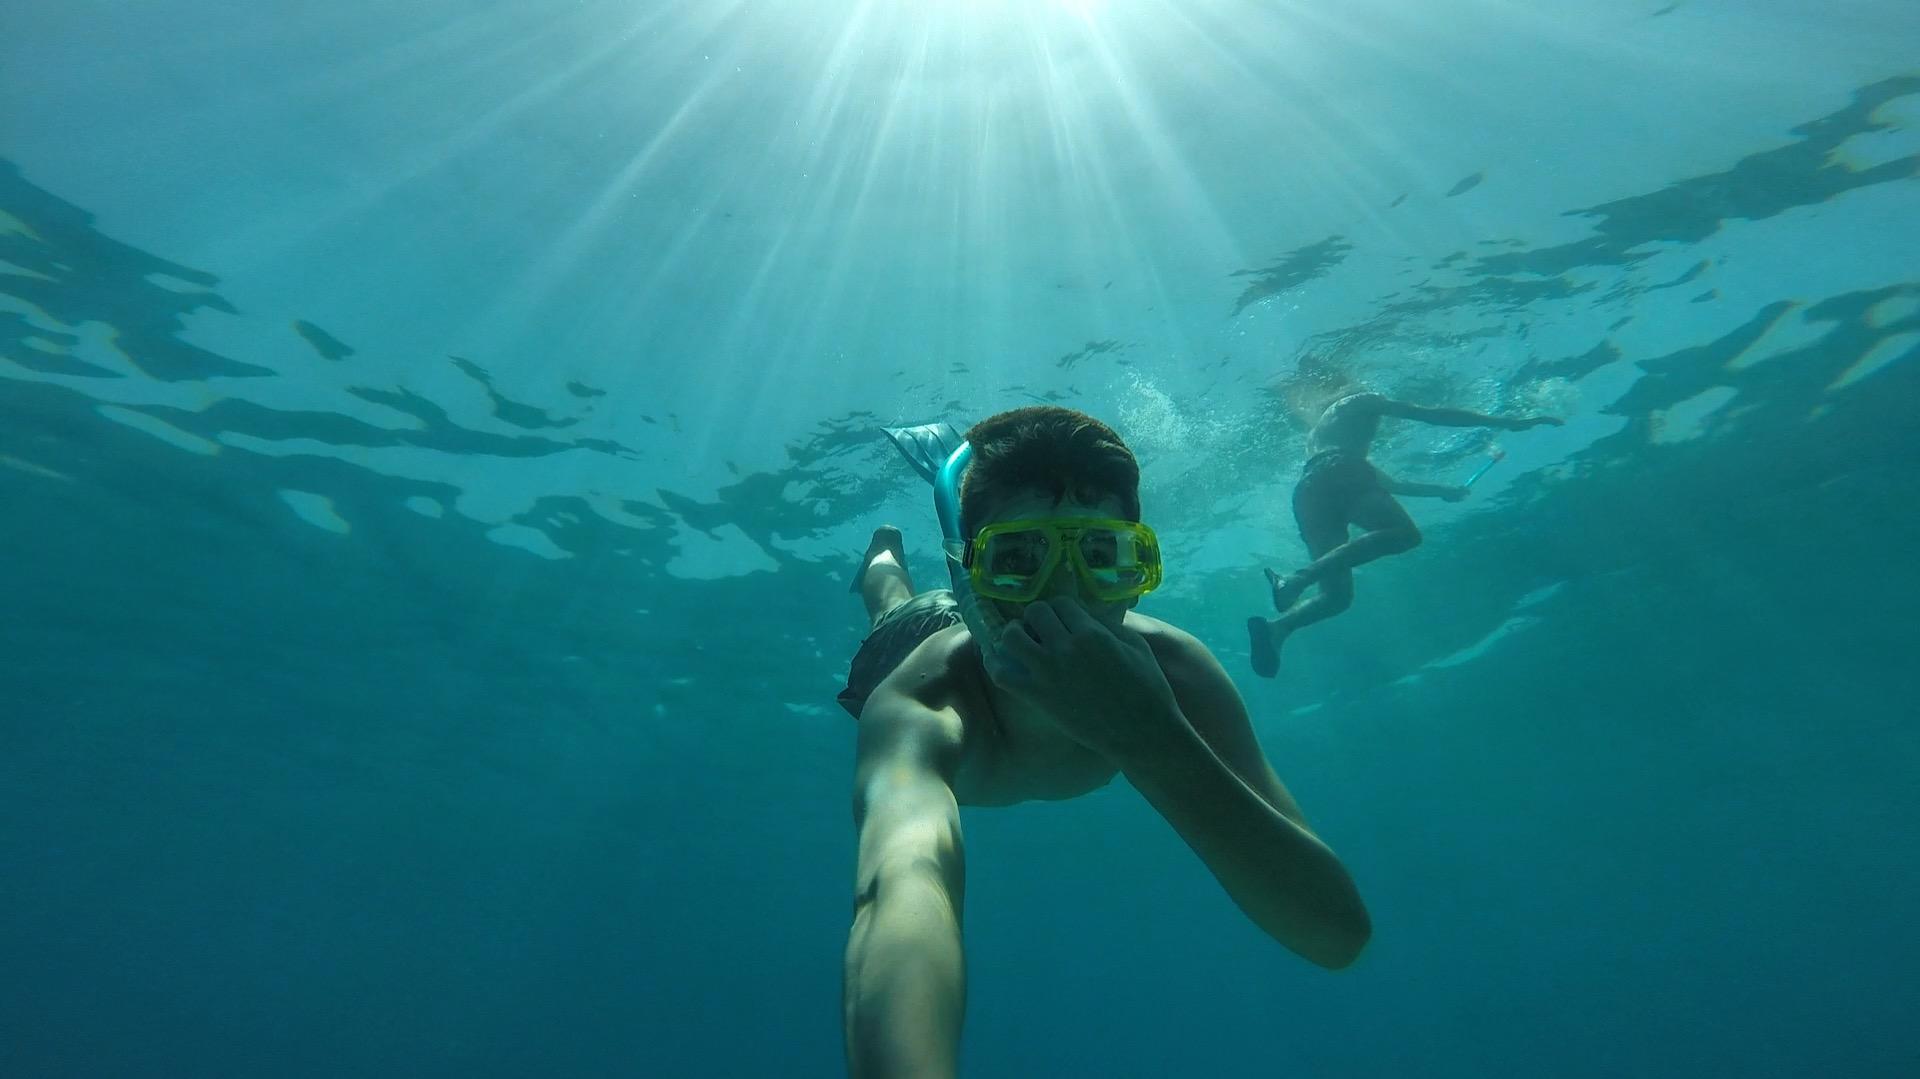 Freediving_צלילה_חופשית.jpg